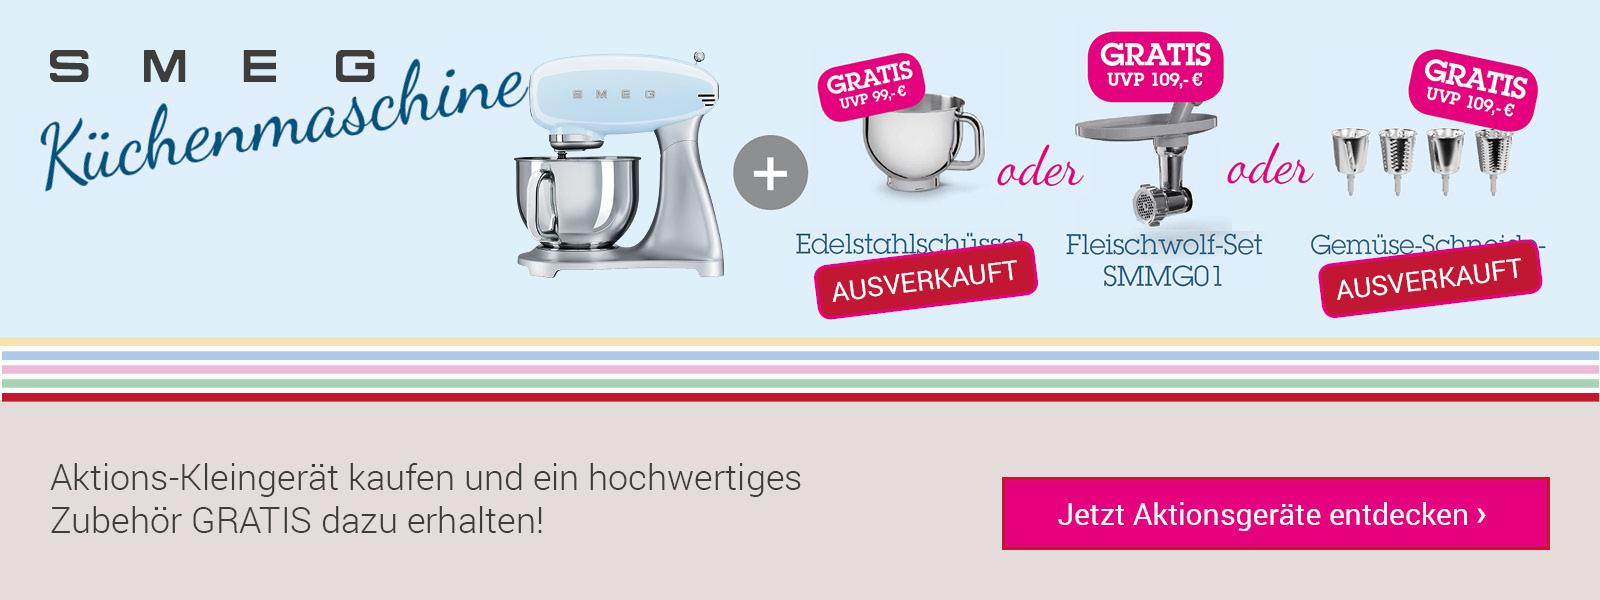 Smeg Kleingeräte-Aktion Küchenmaschine SMF01